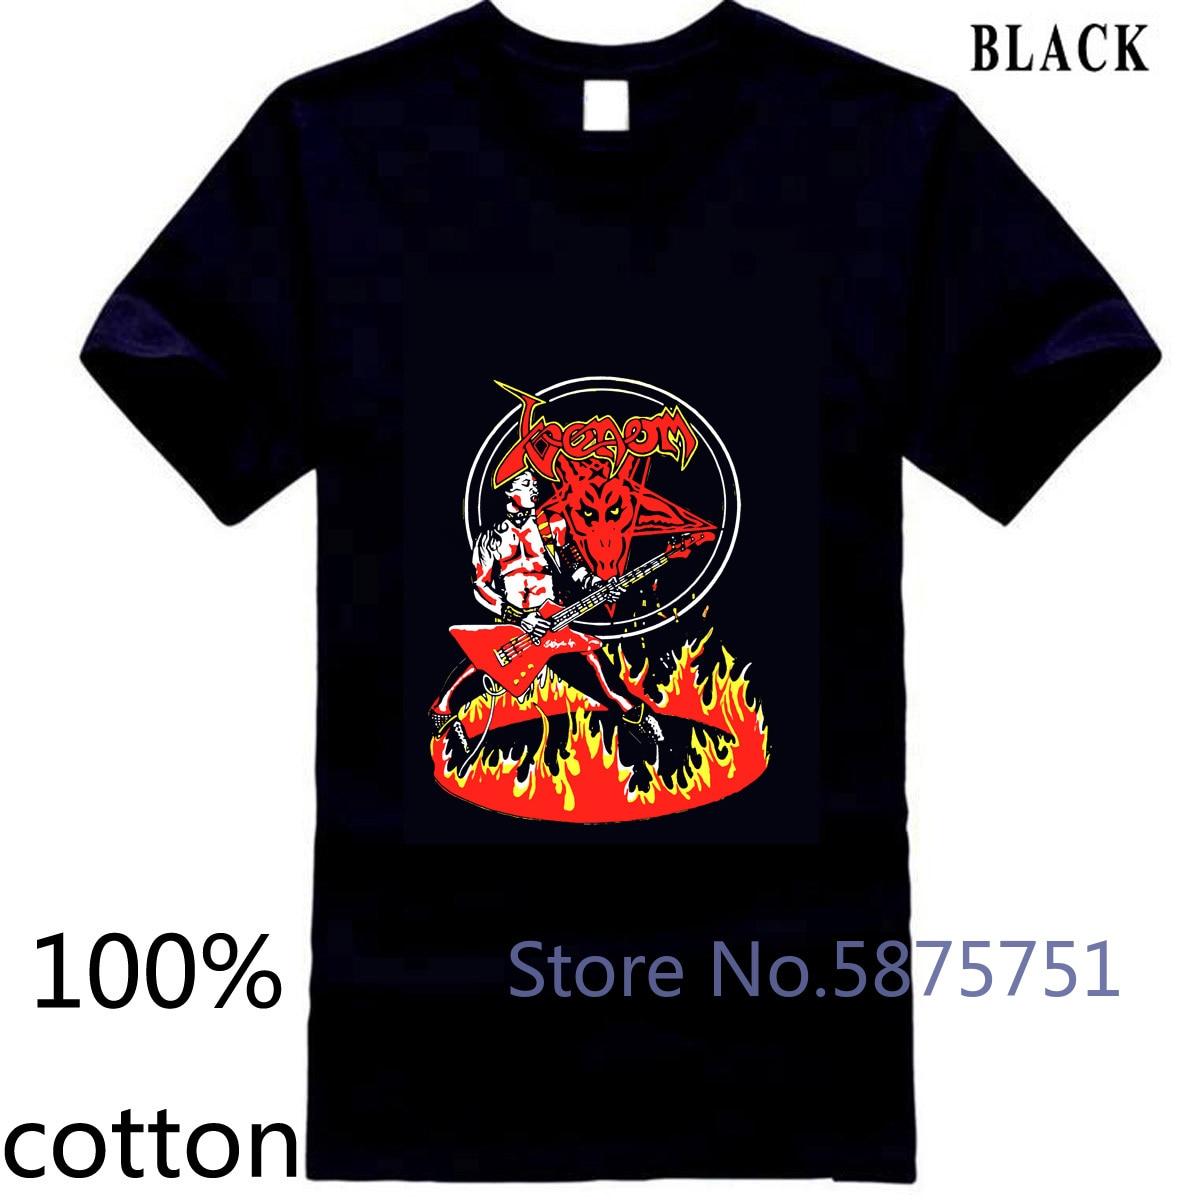 Venom Logo v3 negro metal basura all s 5 hombres camiseta tops camisetas 100% algodón 3XL 4XL 5XL manga corta